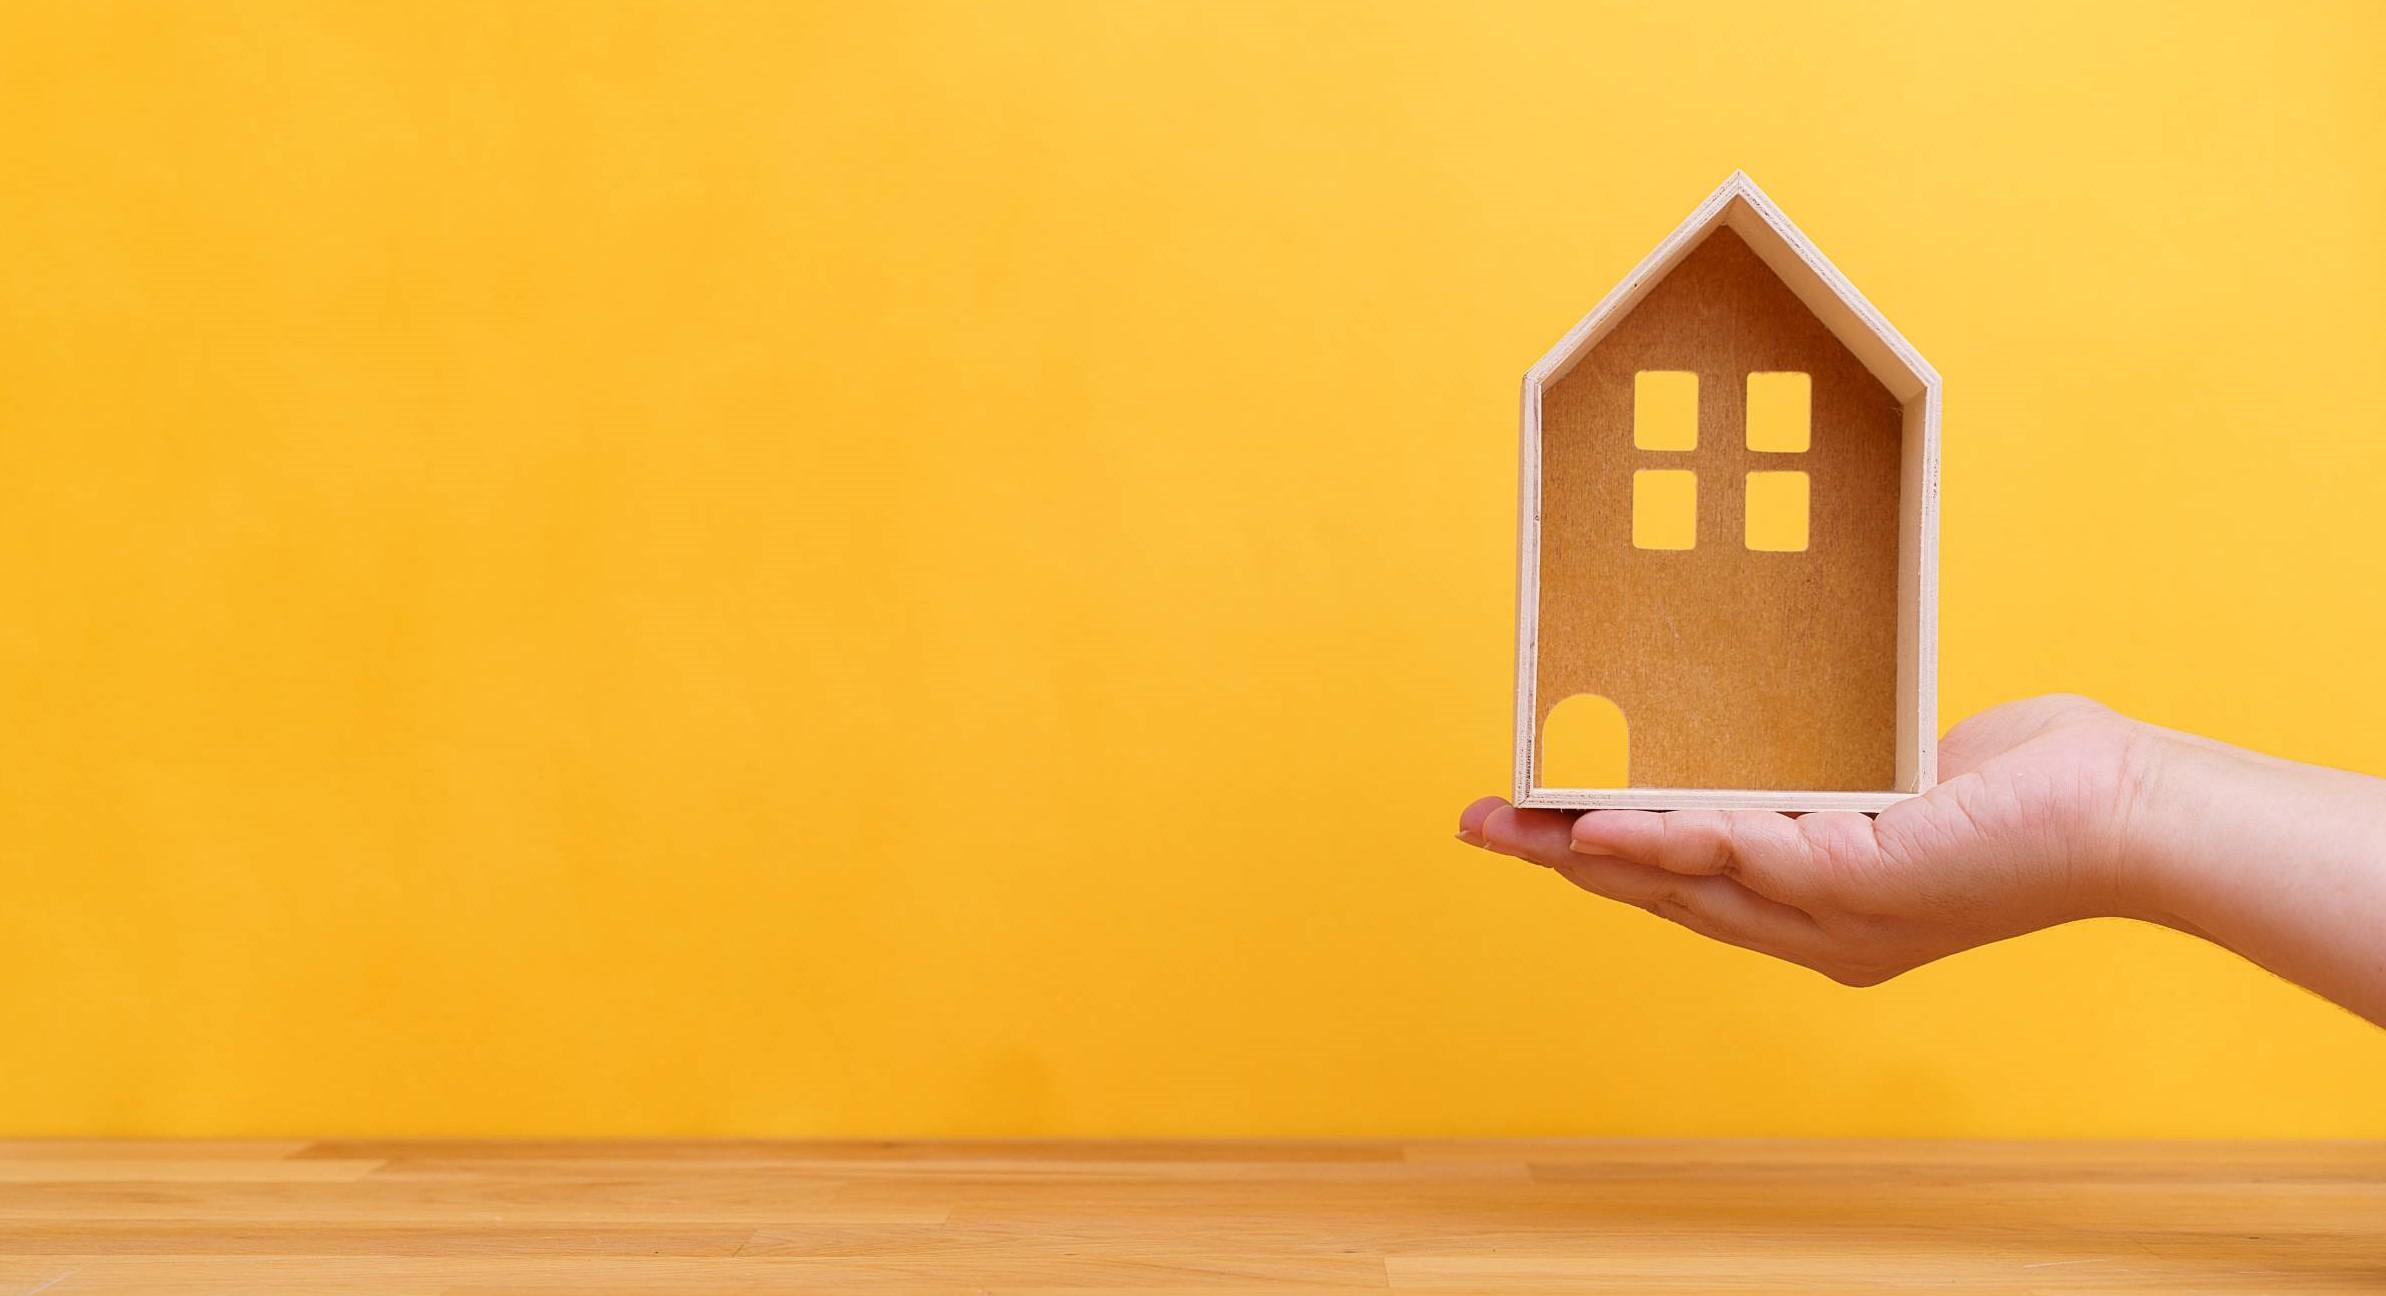 Vastu Shastra of the House helps in bringing Positive Energy